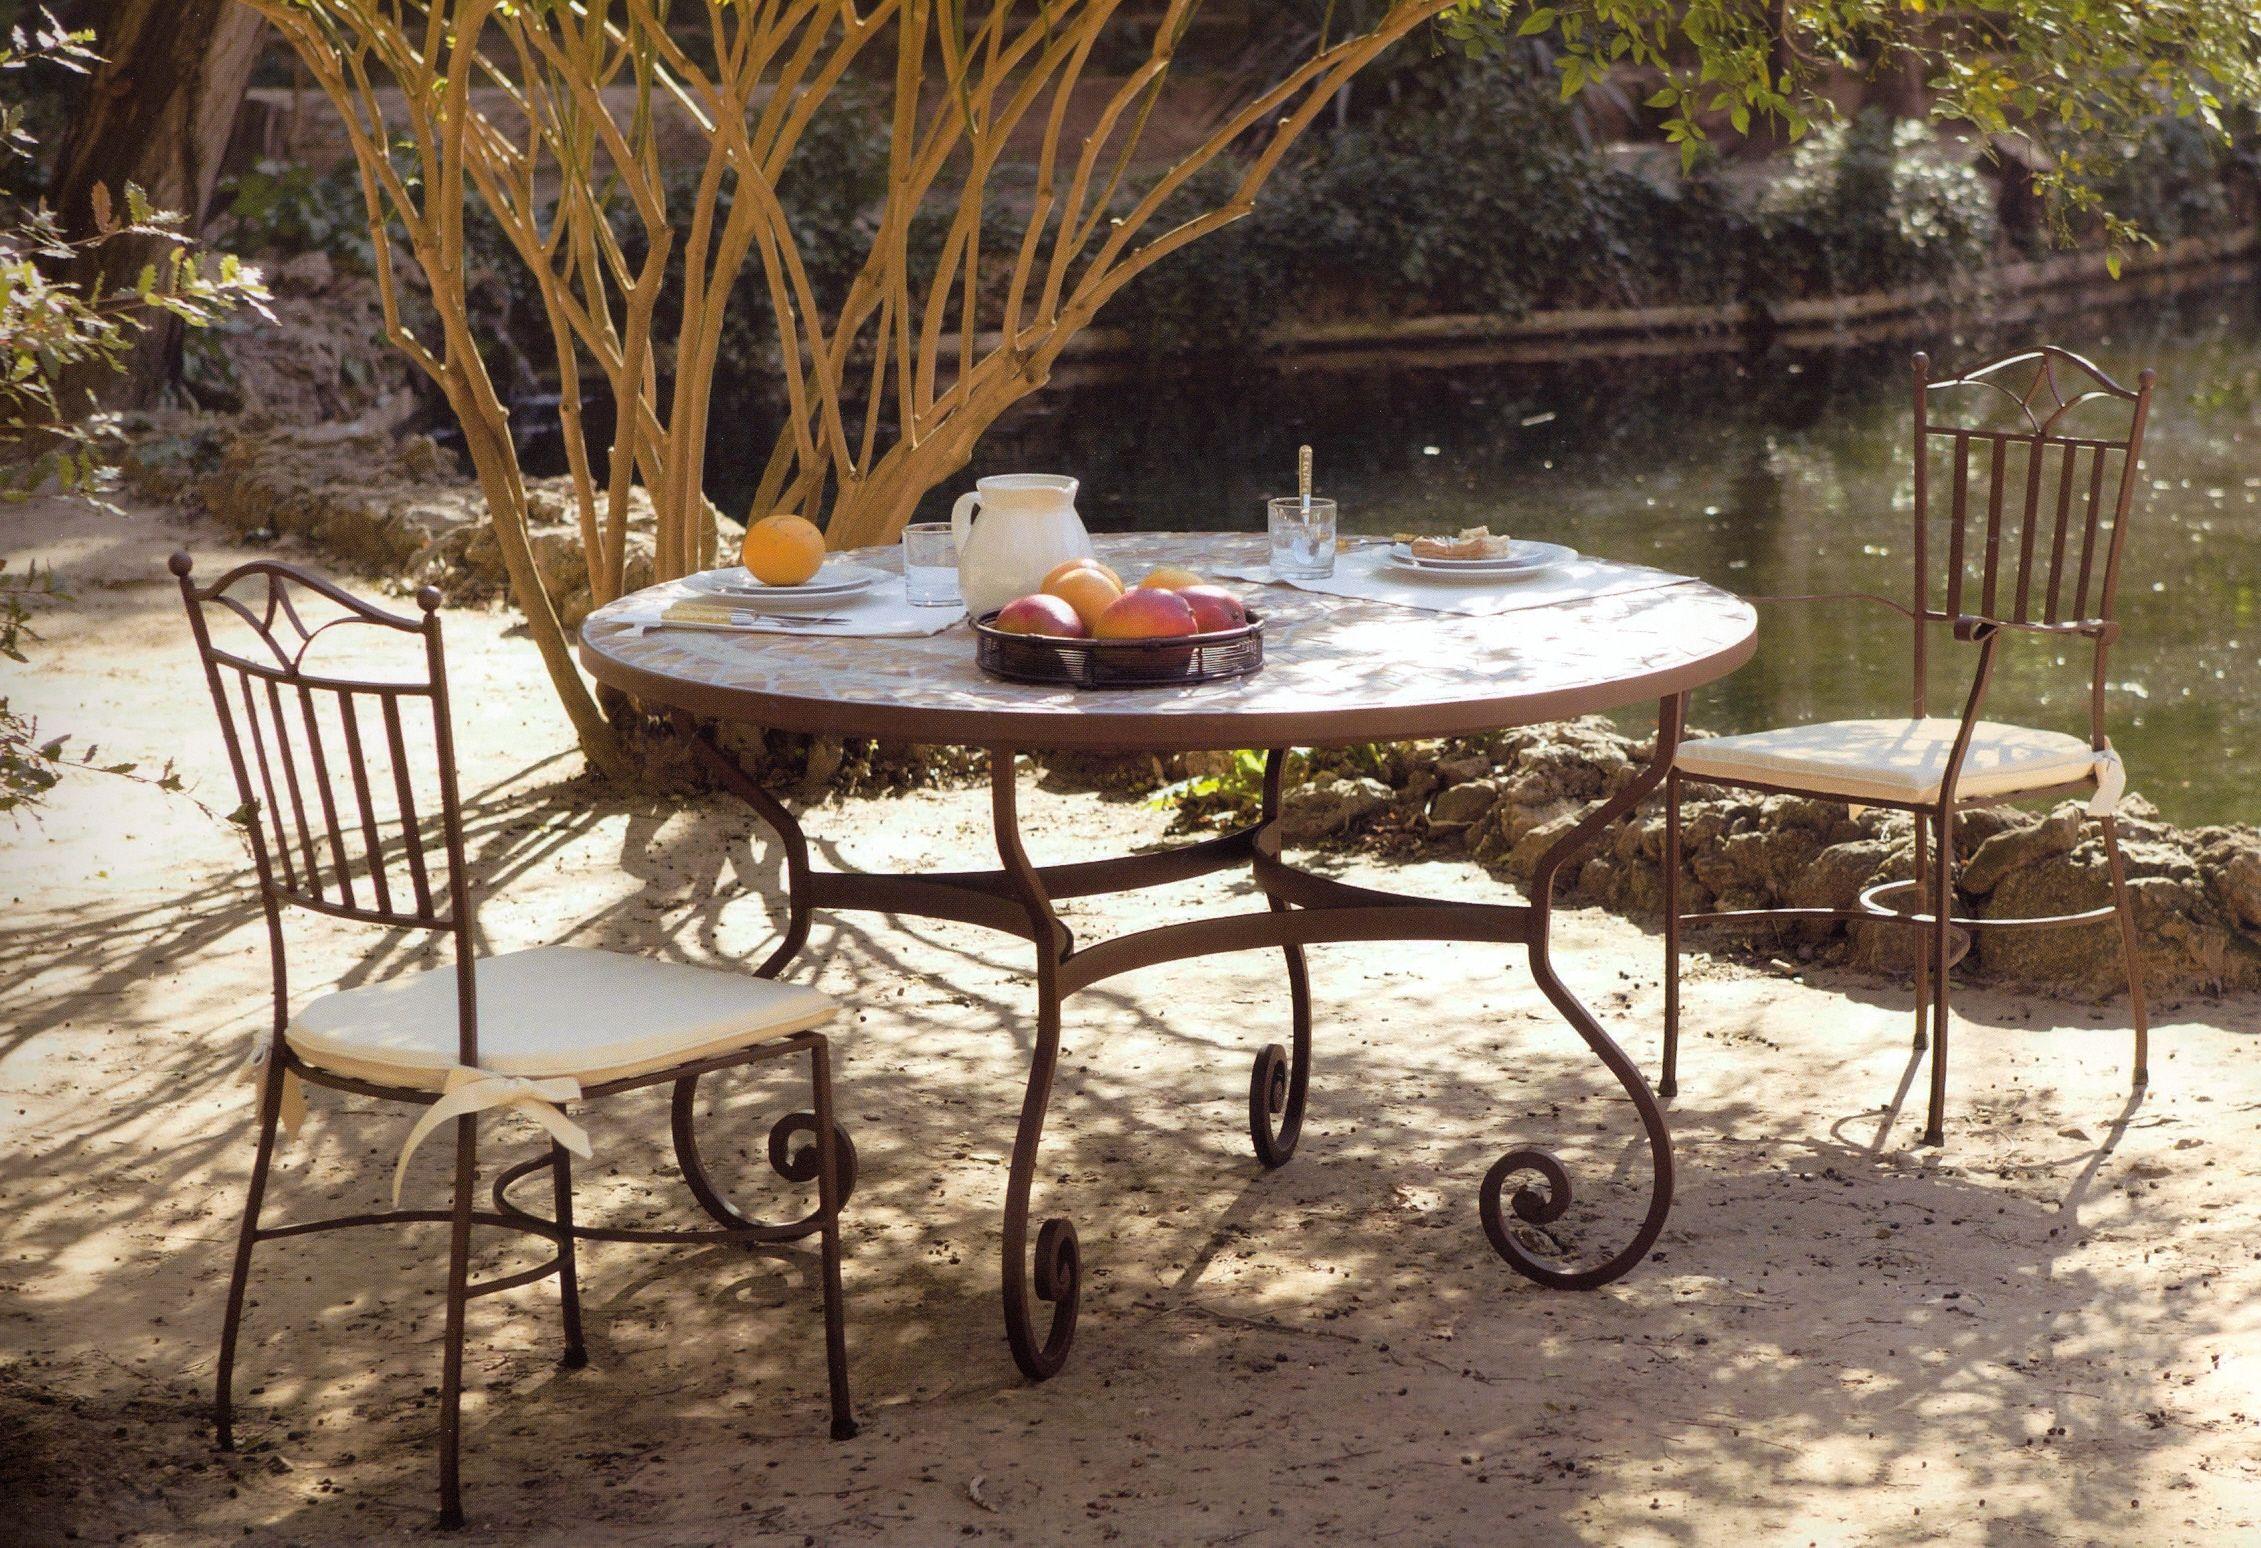 mesa jardim guarda sol:Conjunto Mesa E Cadeira Com Guarda Sol Jardim Varanda Piscina Bali Mor